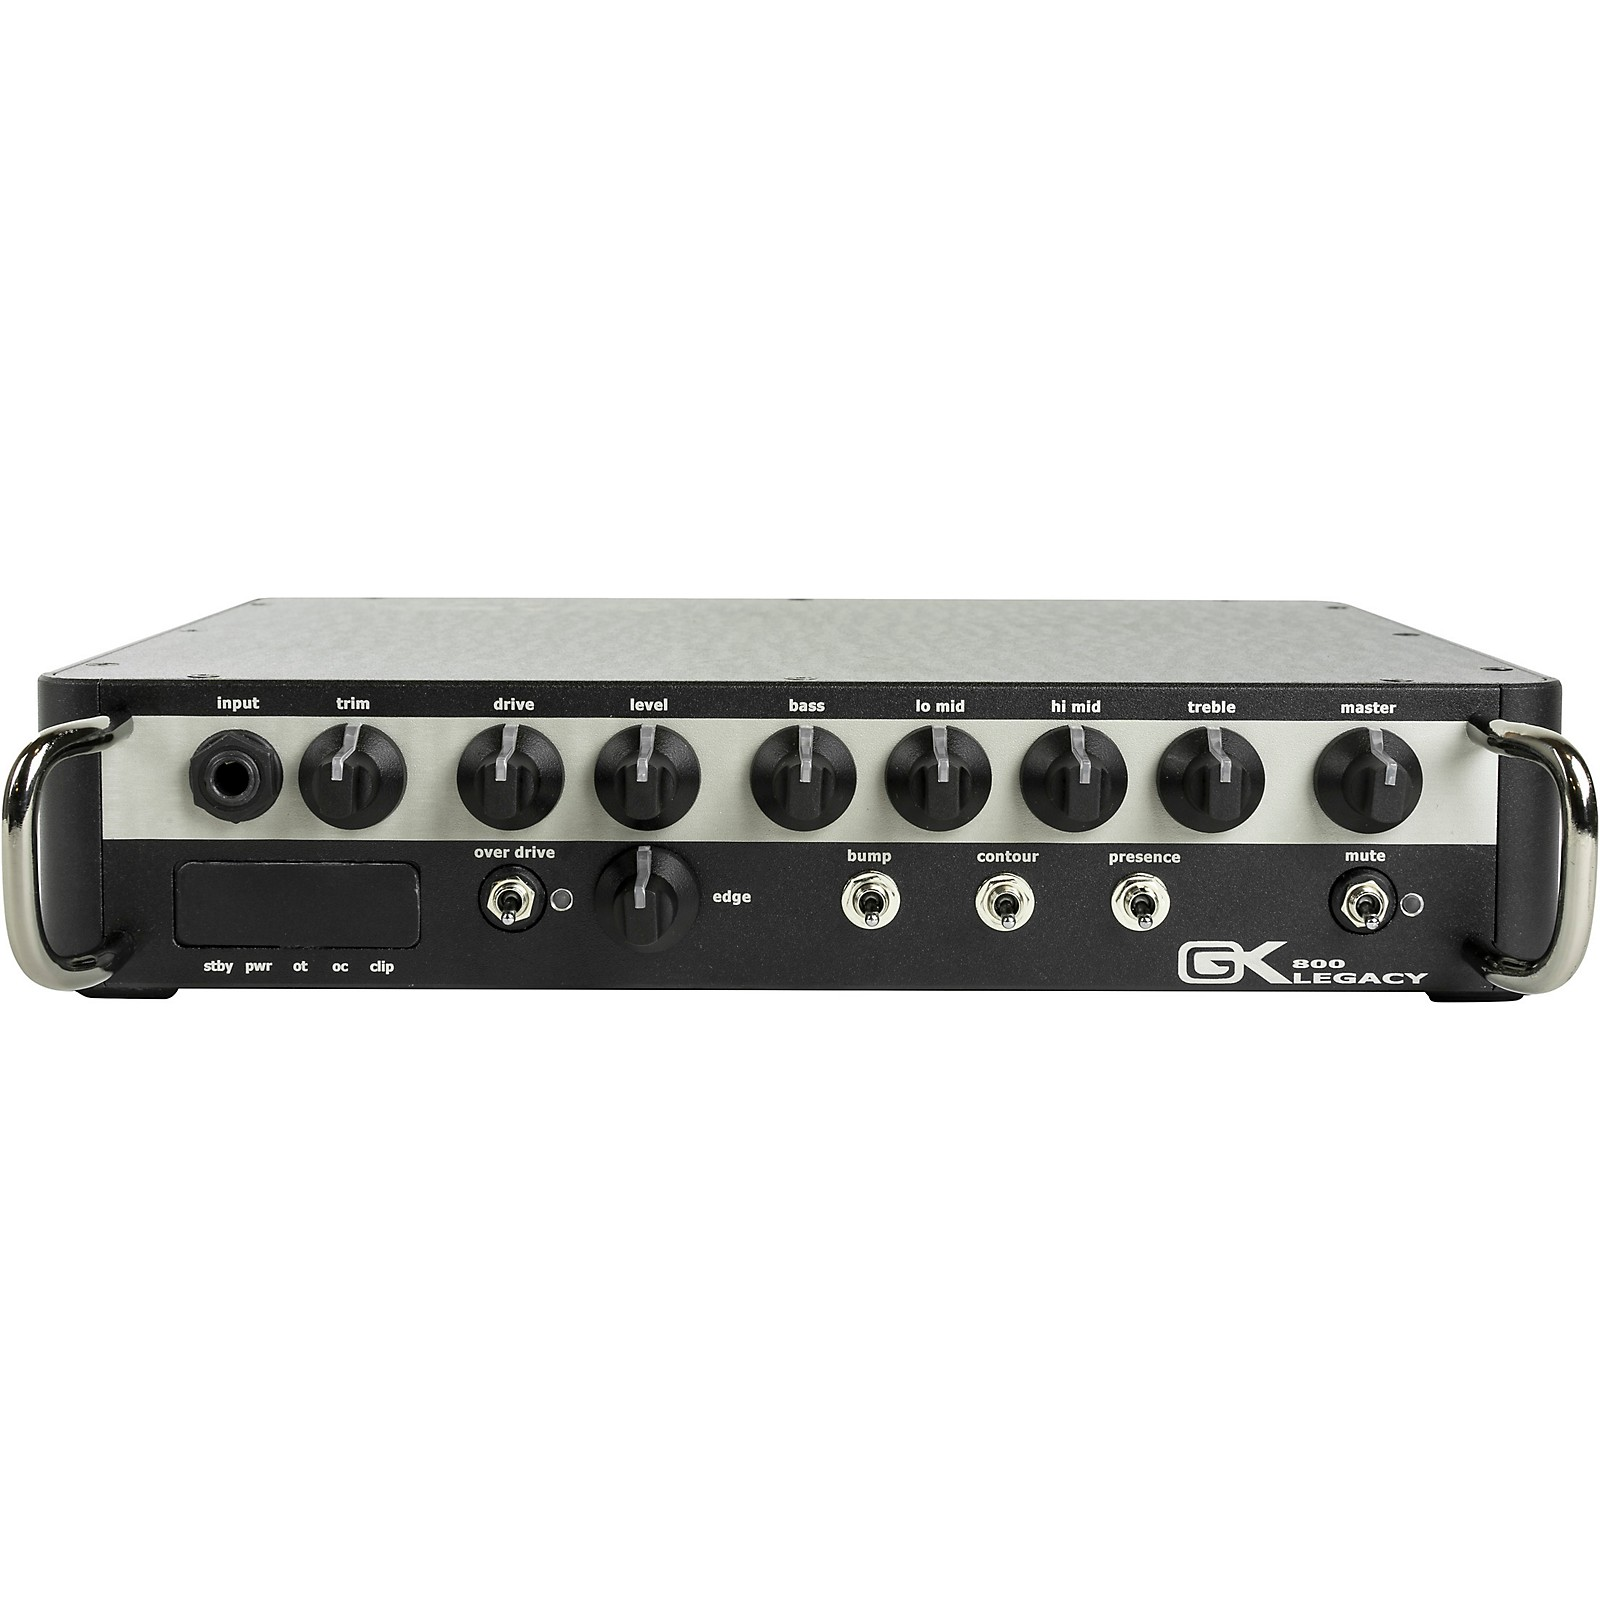 Gallien-Krueger Legacy 800 800W Bass Amp Head